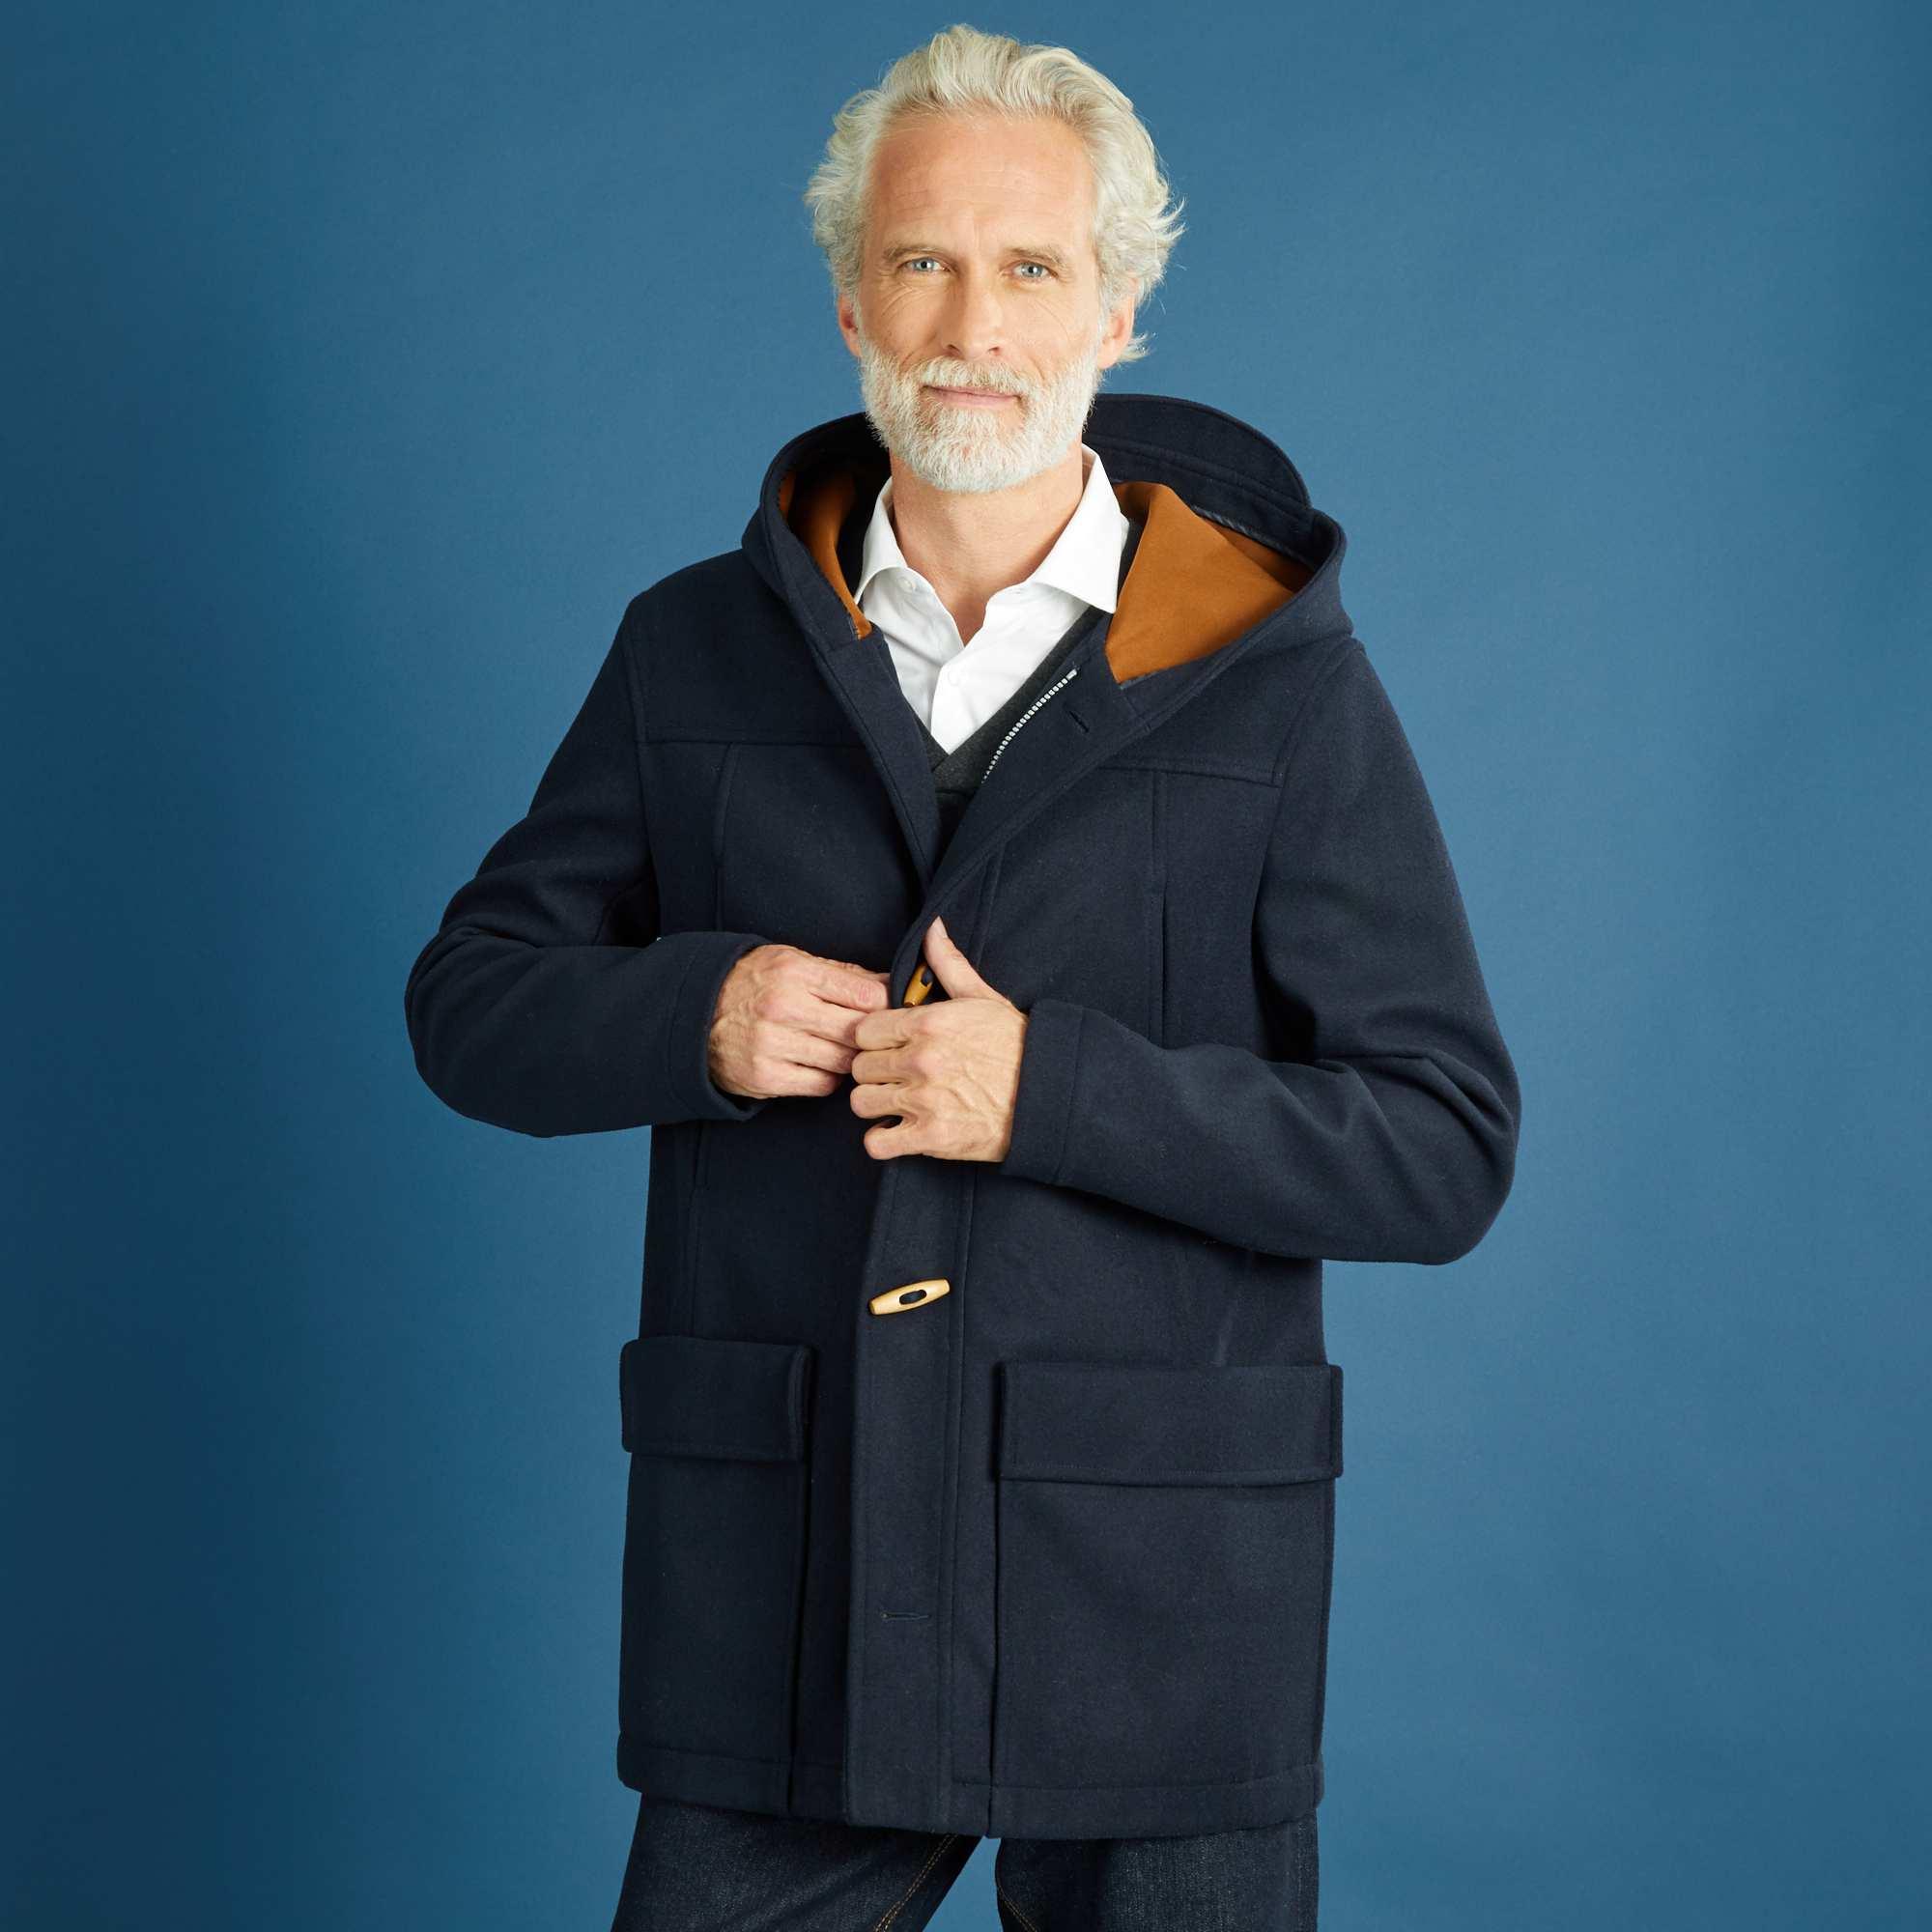 parka 39 duffle 39 capuche homme bleu marine kiabi 25 00. Black Bedroom Furniture Sets. Home Design Ideas